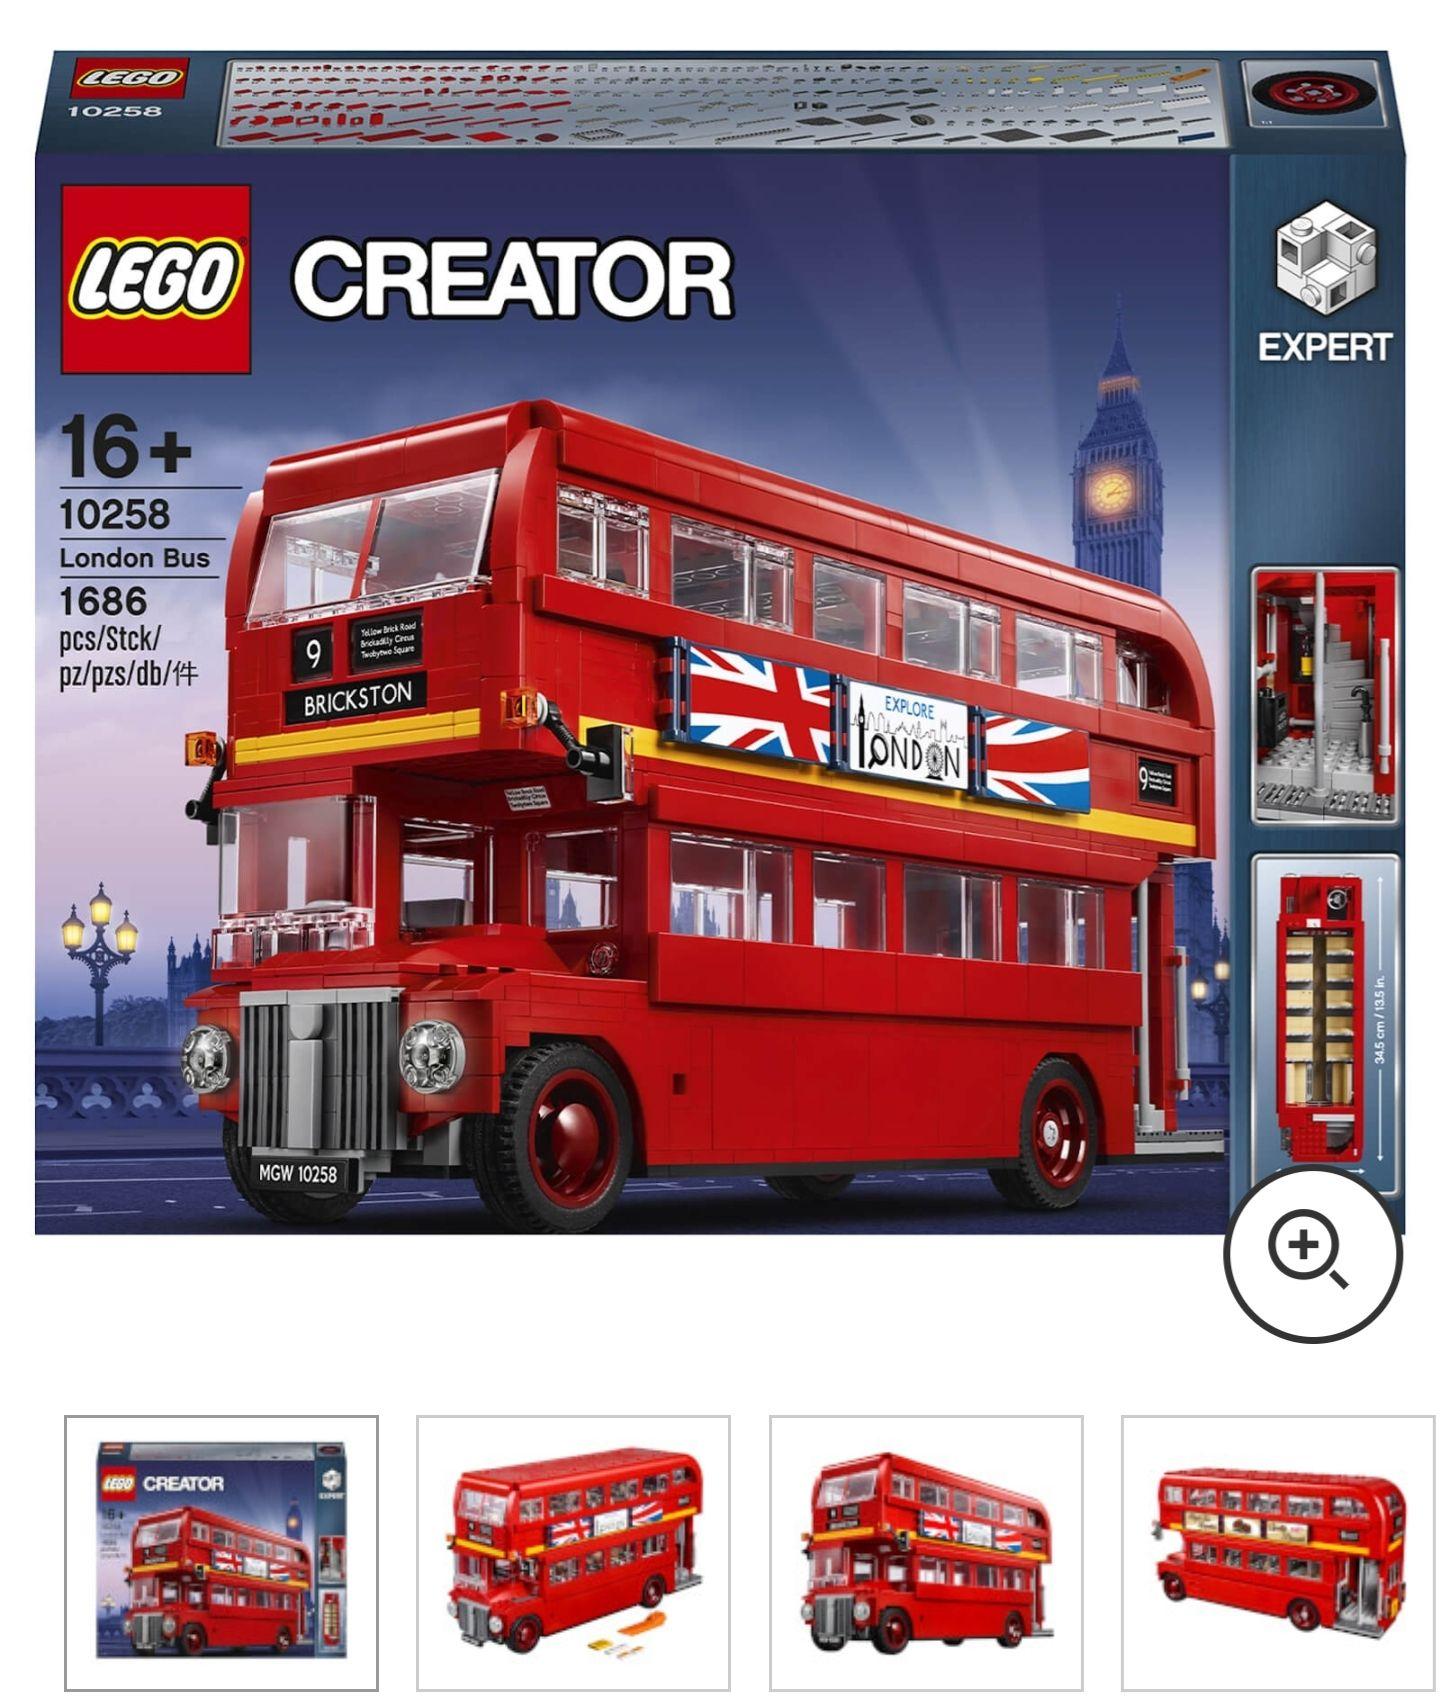 LEGO CREATOR EXPERT Londense Bus (10258)